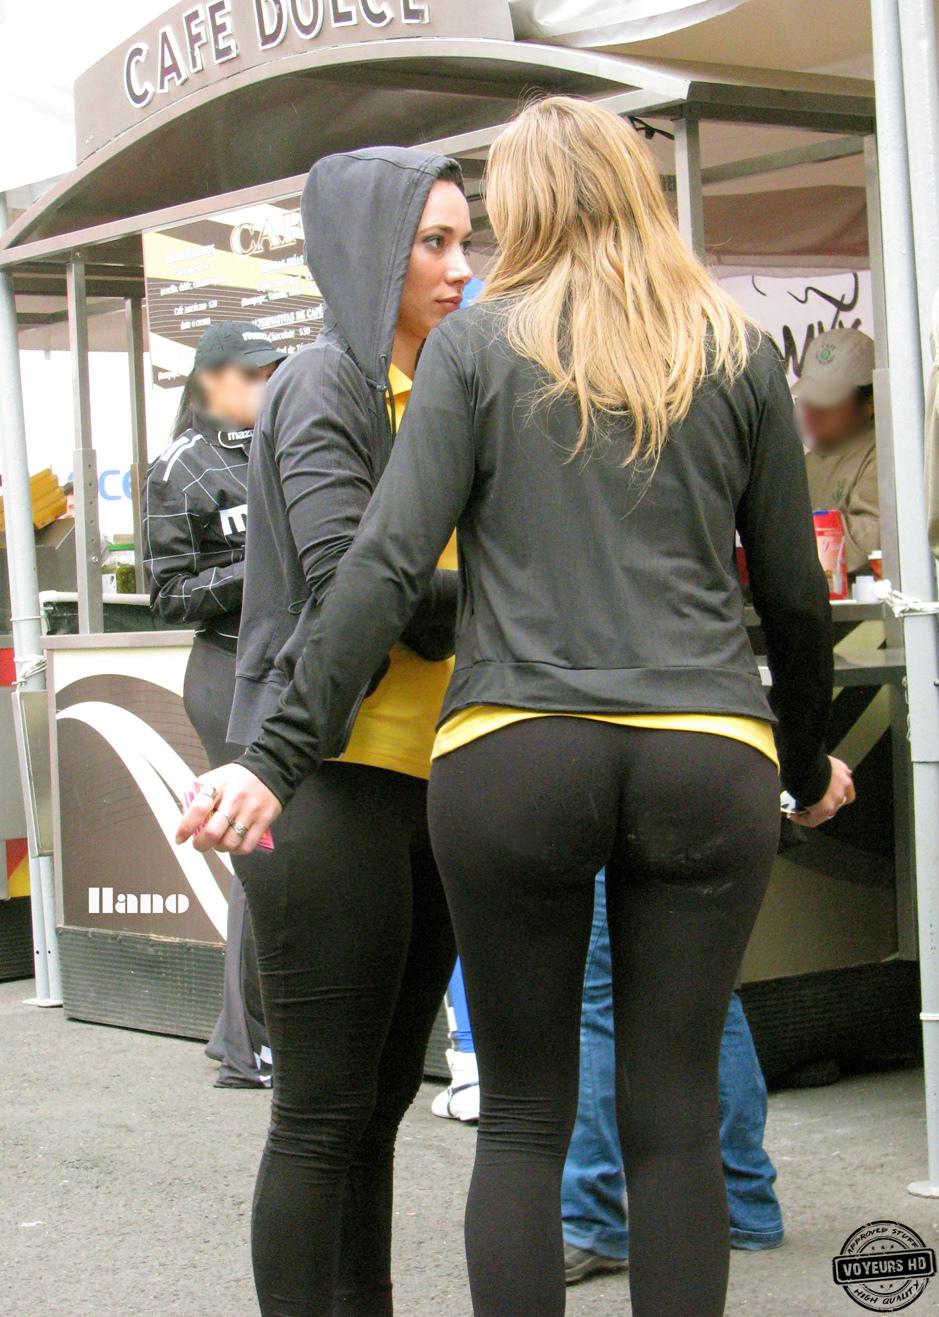 girl in tight jeans photo